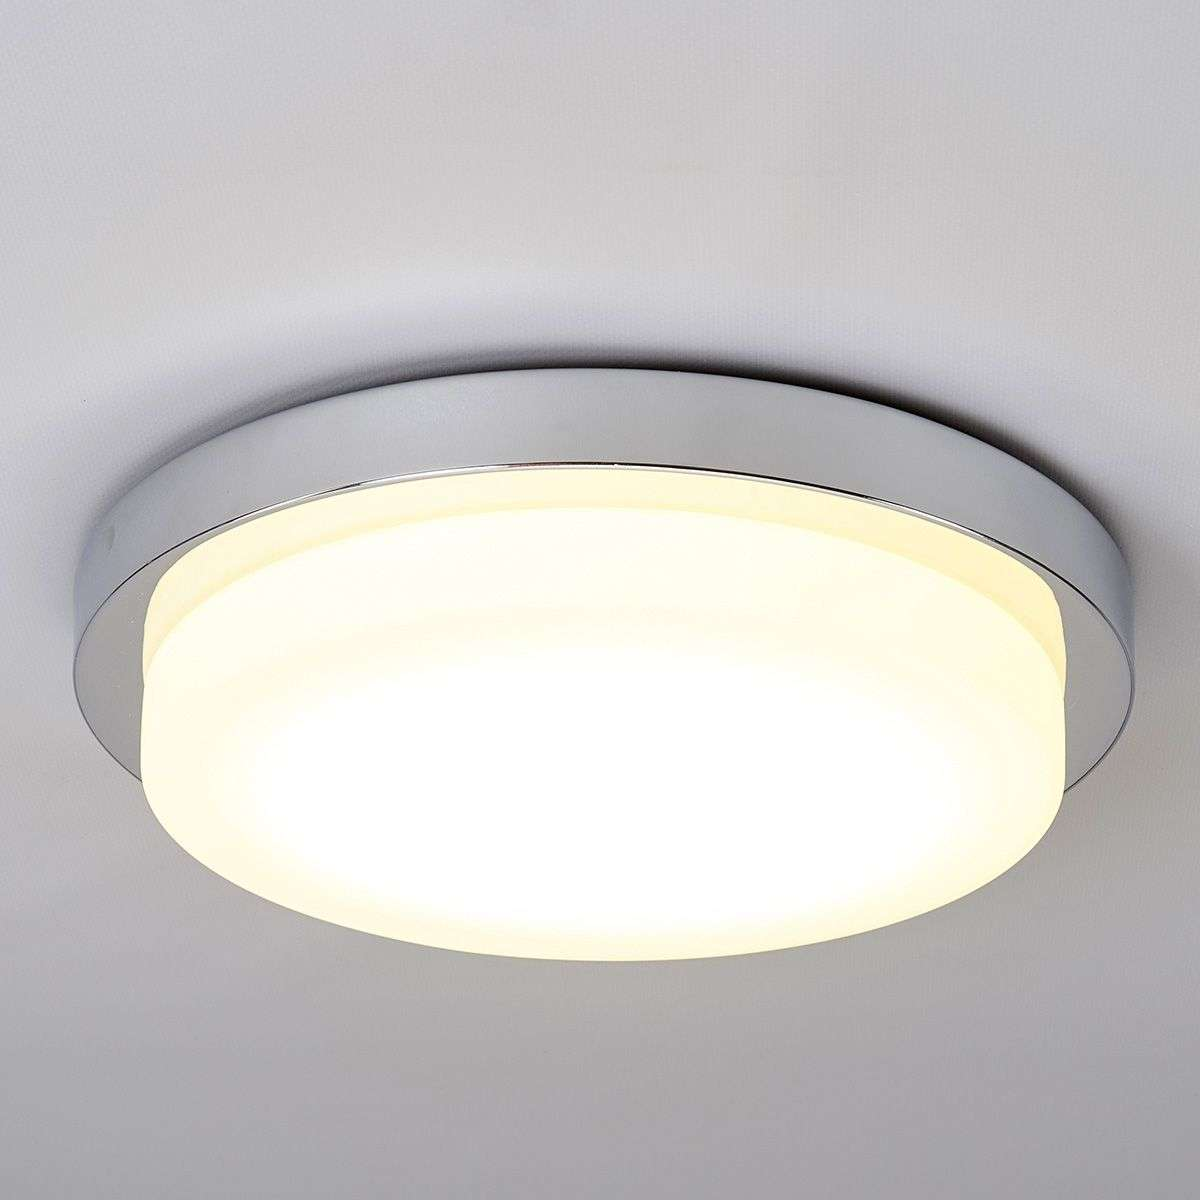 Adriano - LED bathroom ceiling light | Lights.ie